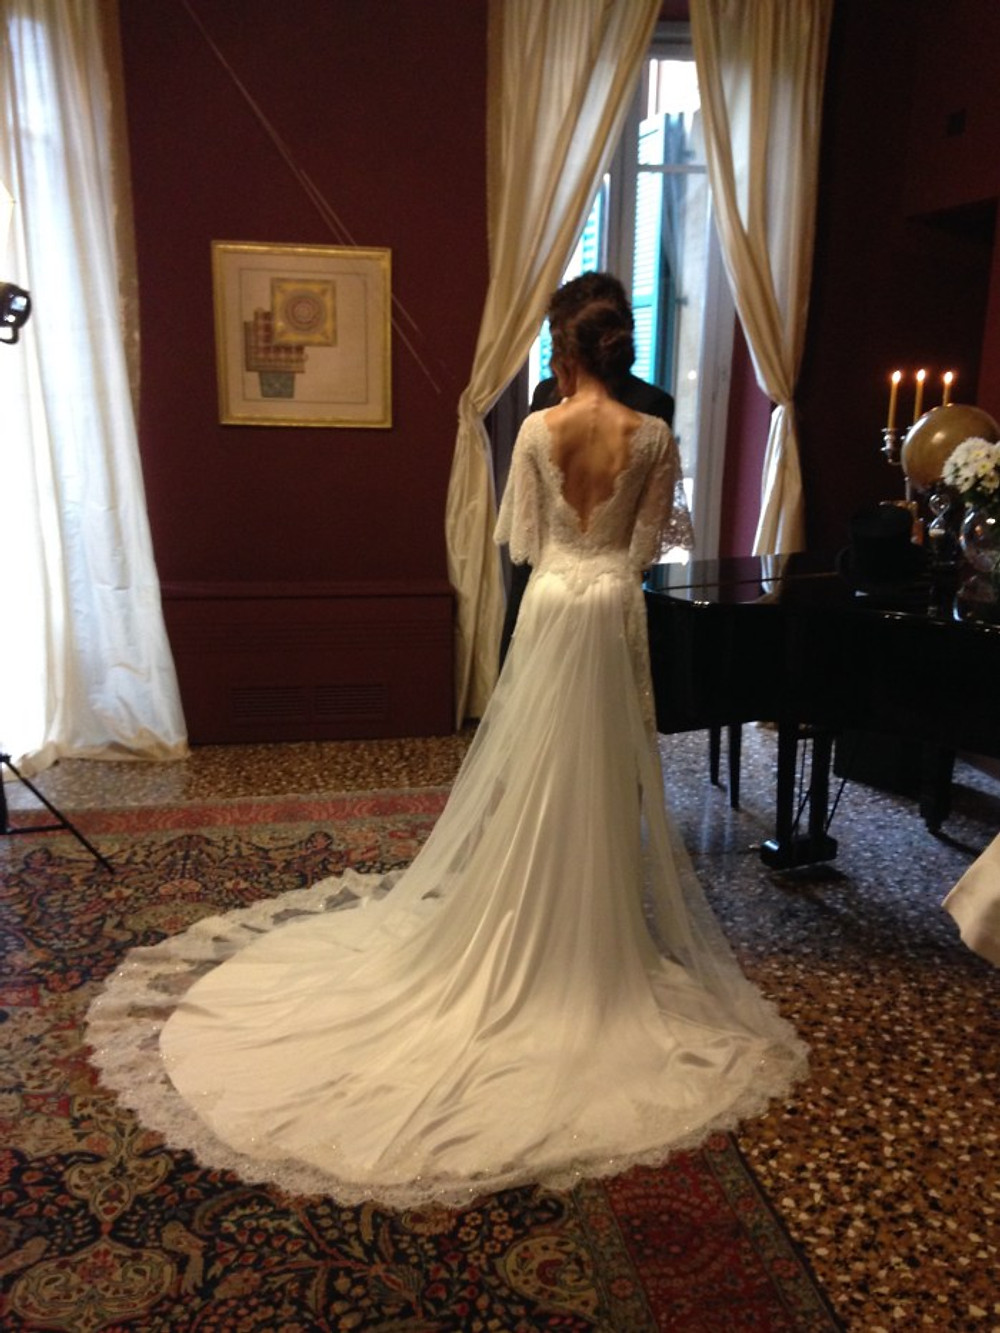 '16.04.30-francescarocco-wedding - 23 di 60